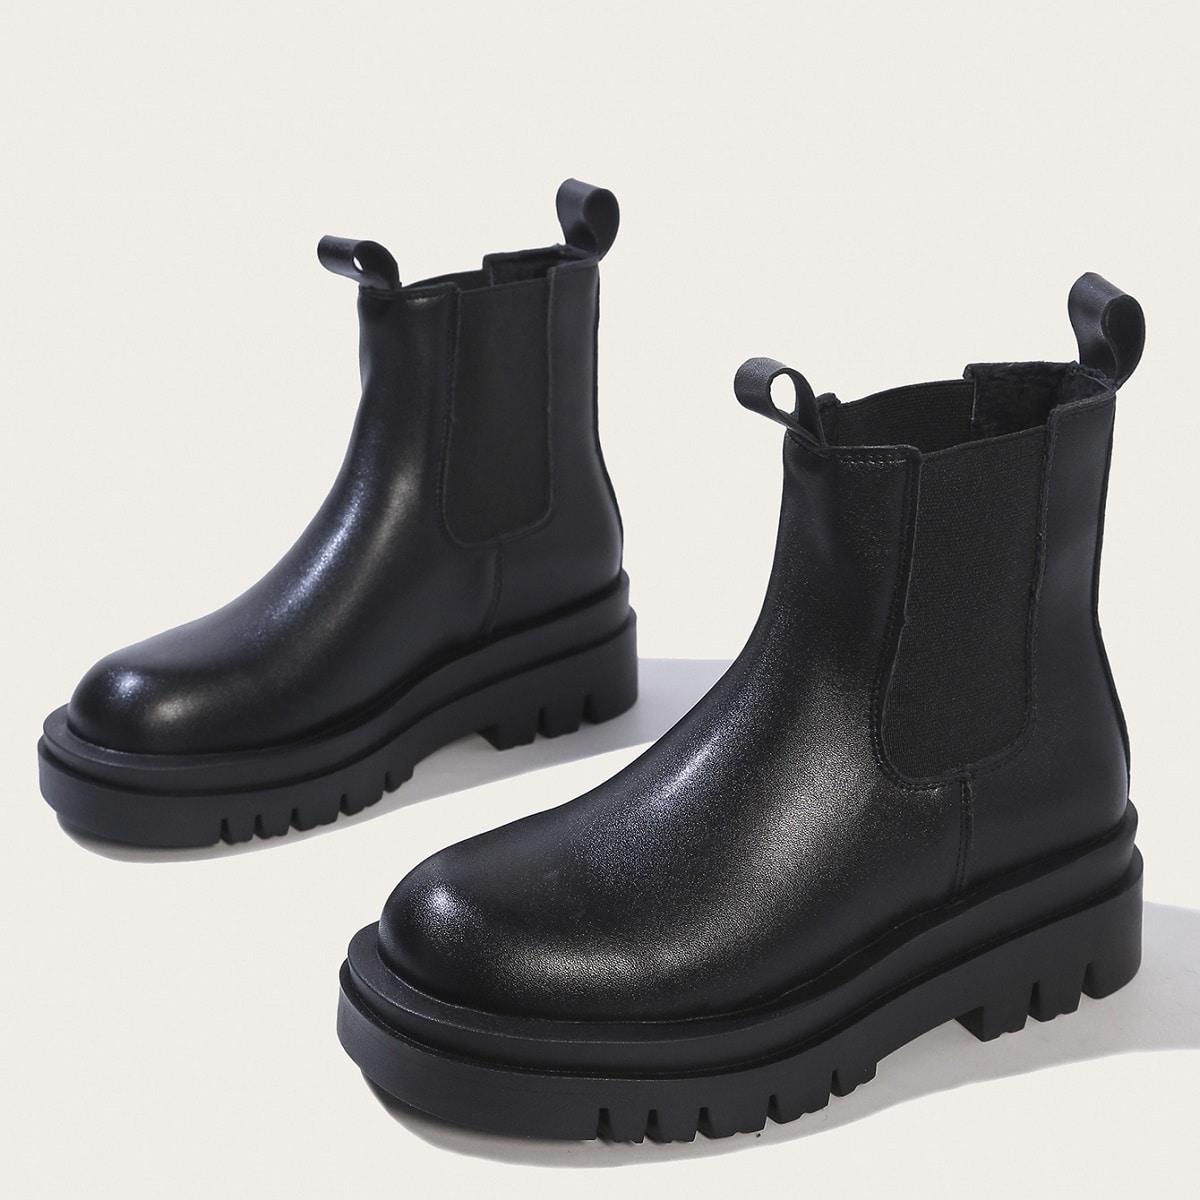 Минималистичные ботинки челси